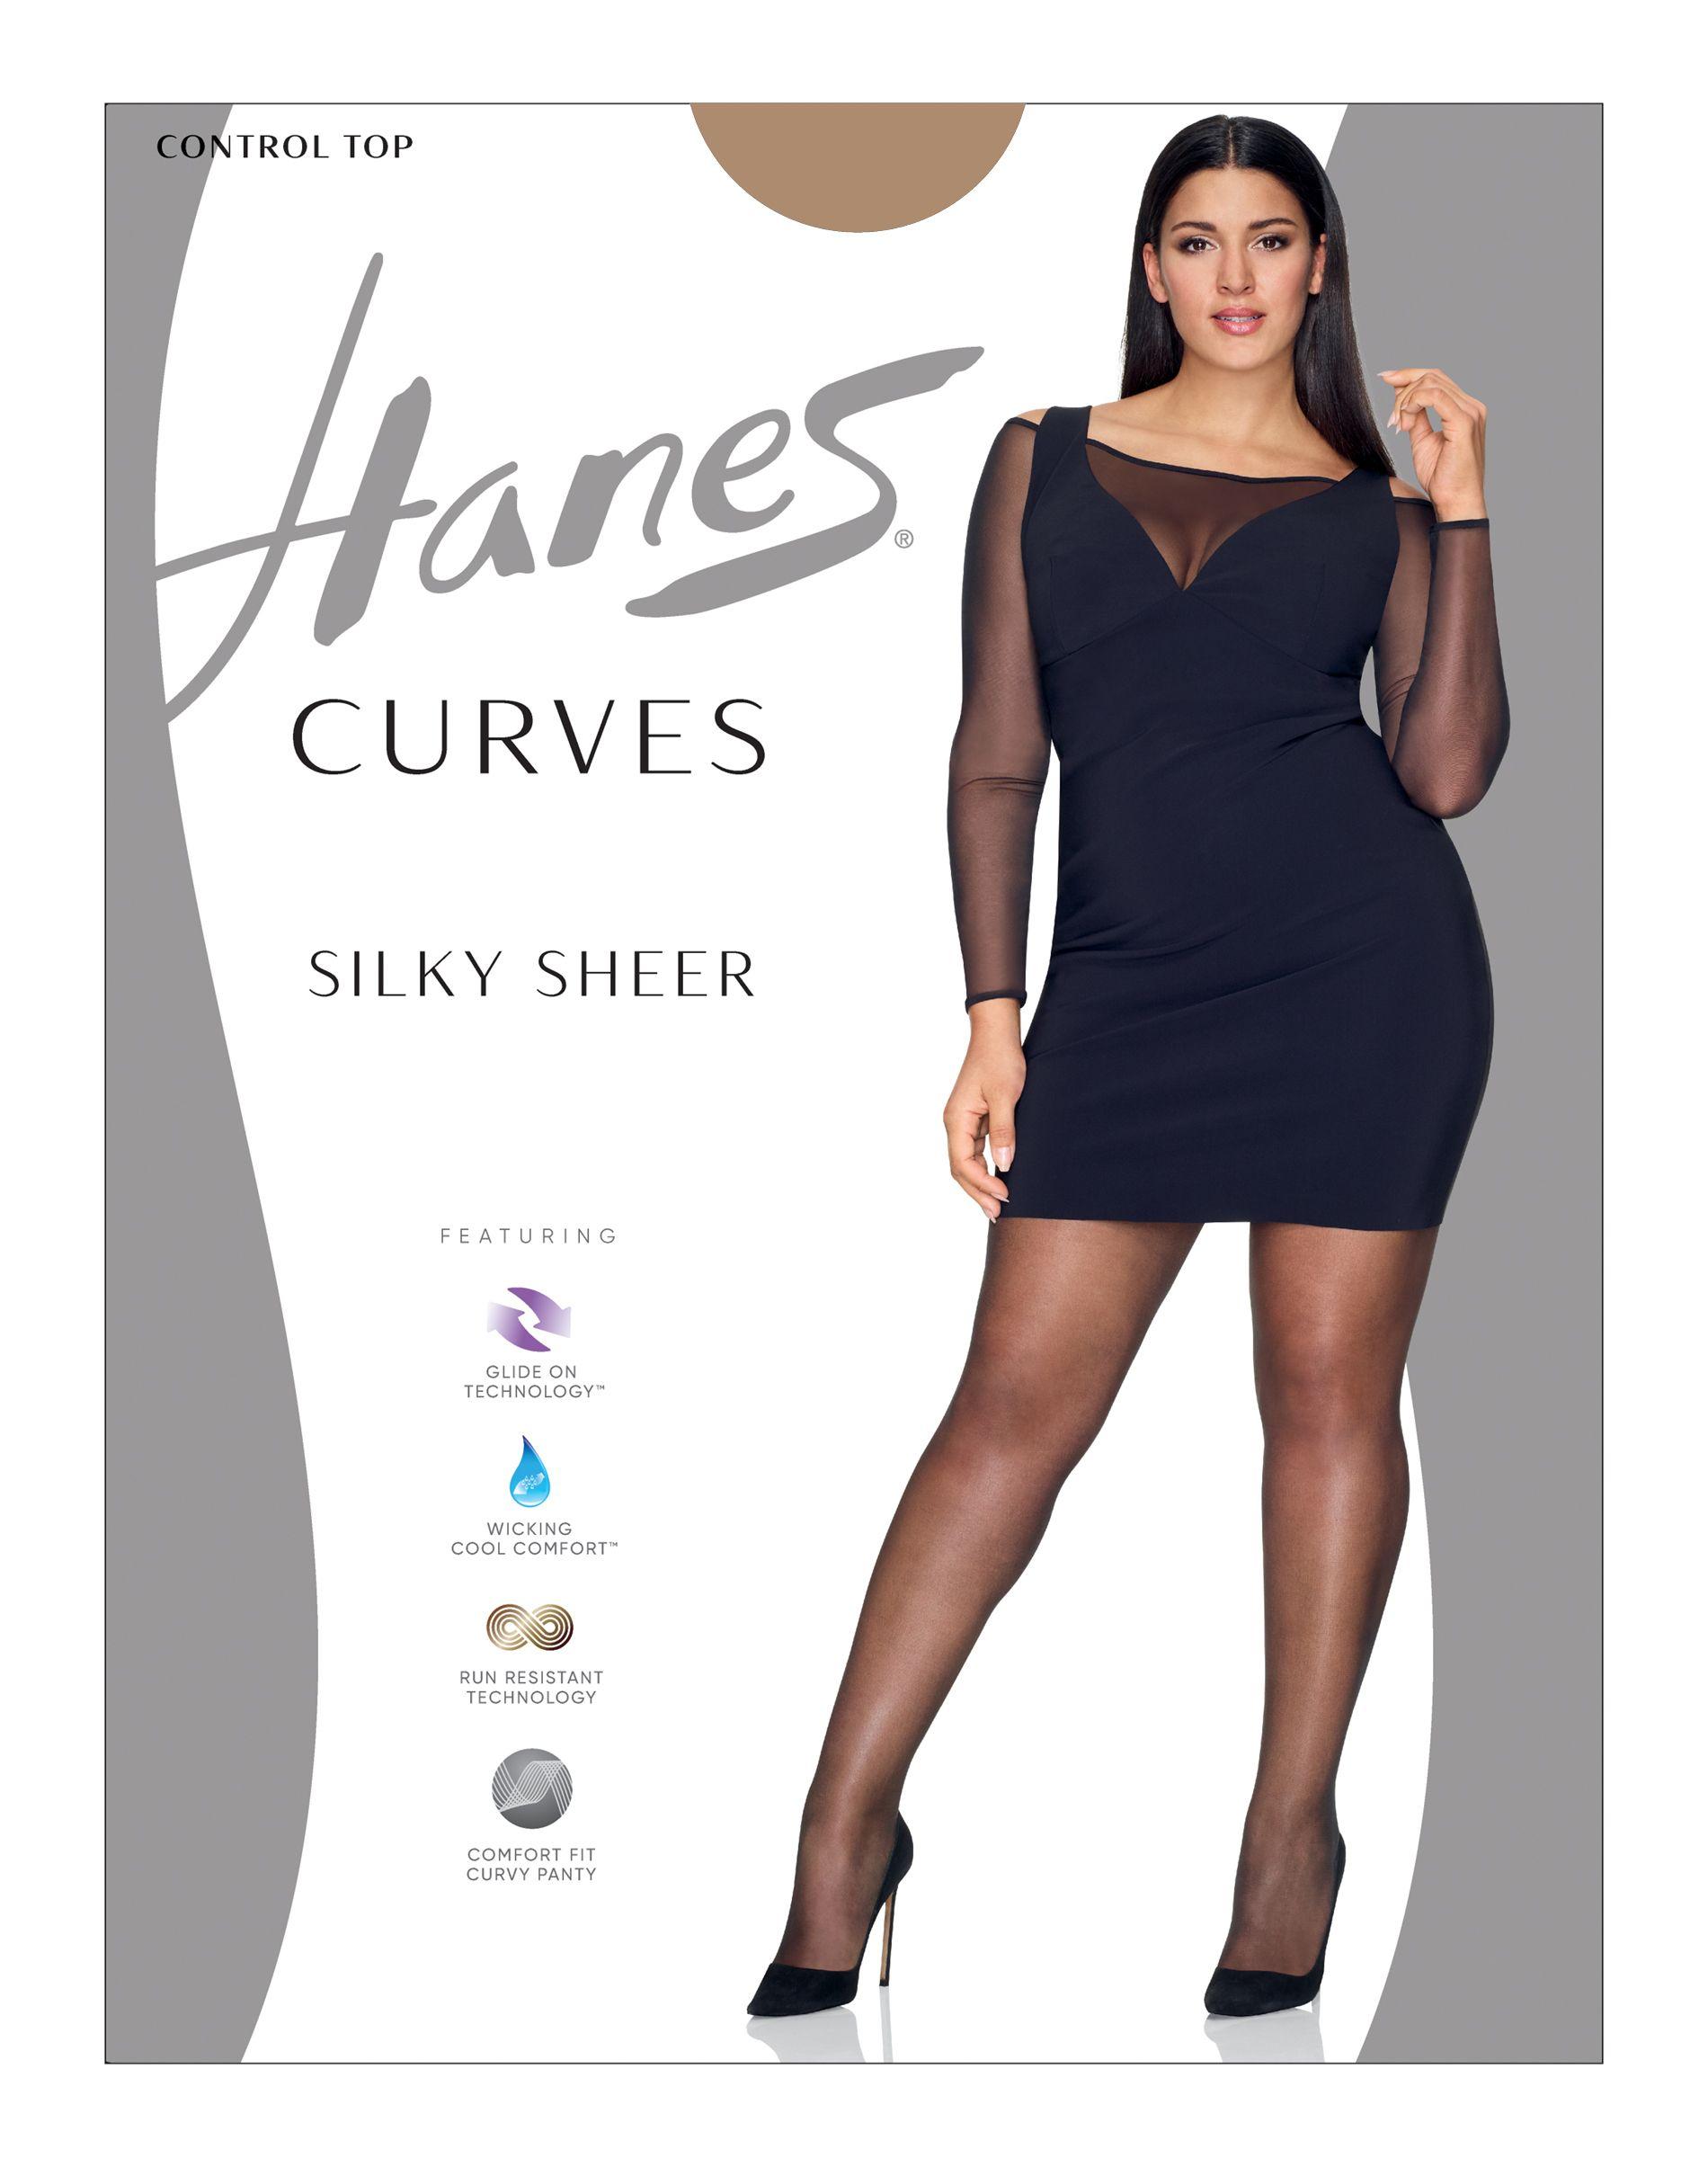 Hanes Curves Silky Sheer Control Top Legwear women Hanes